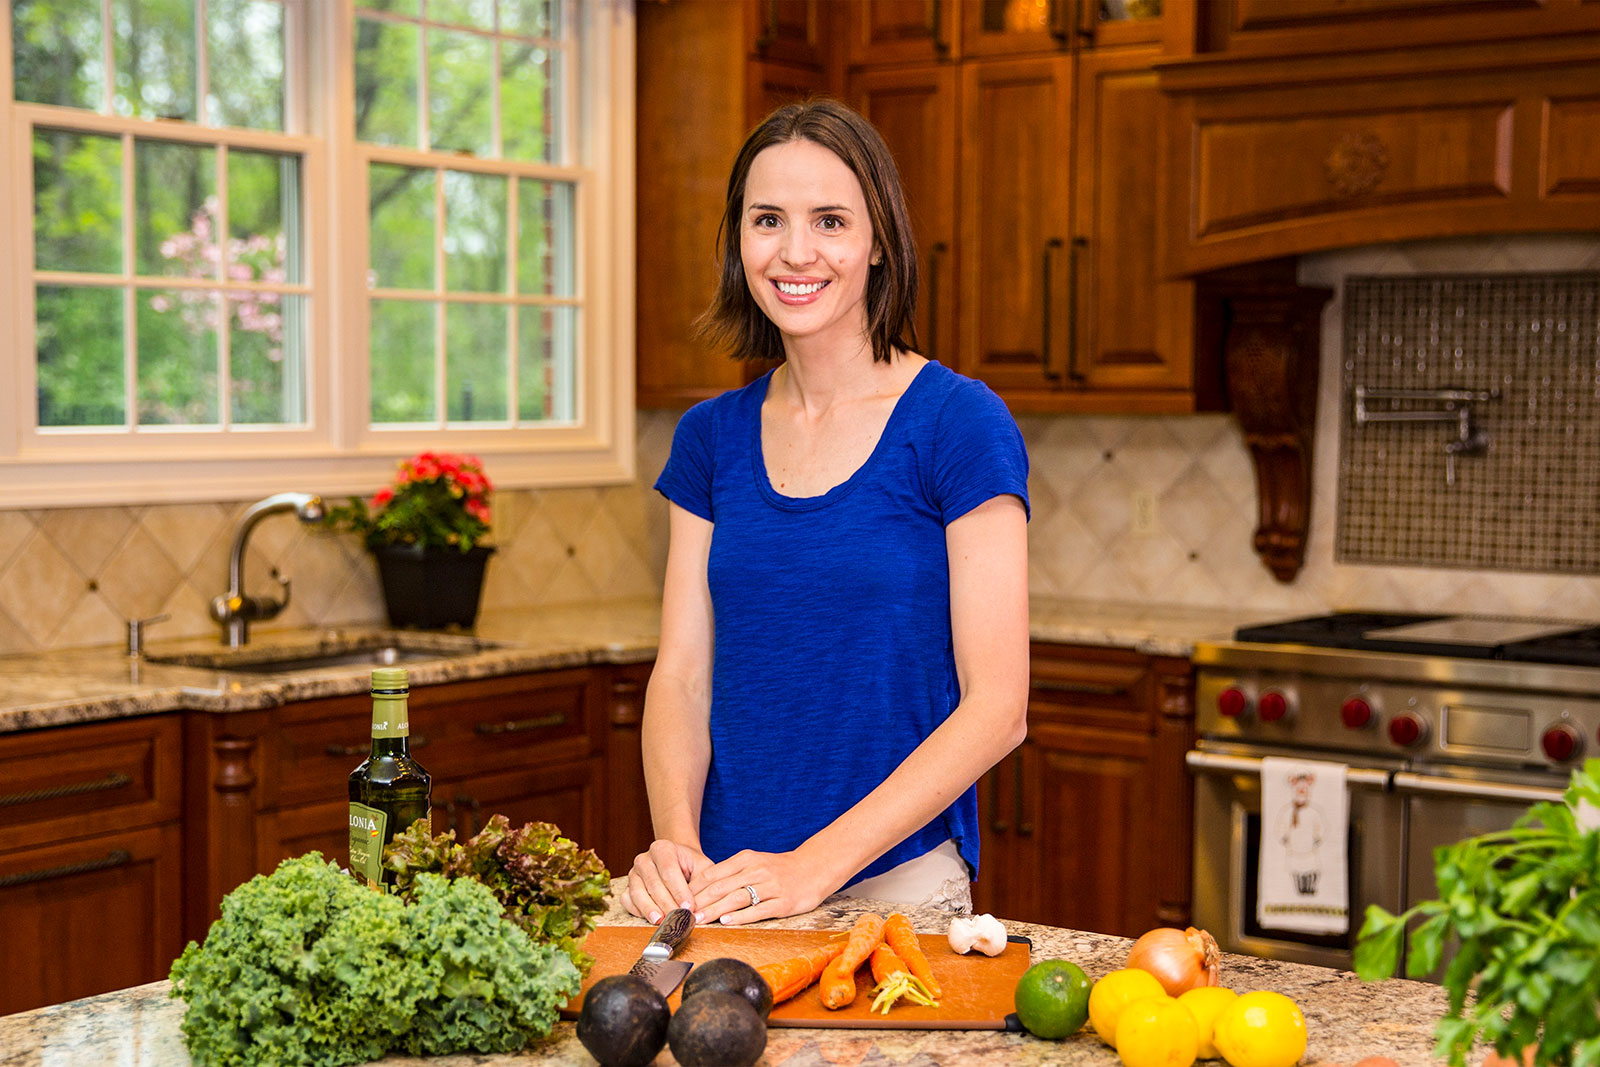 Katherine Mattox, RDN Registered Dietitian Nutritionist